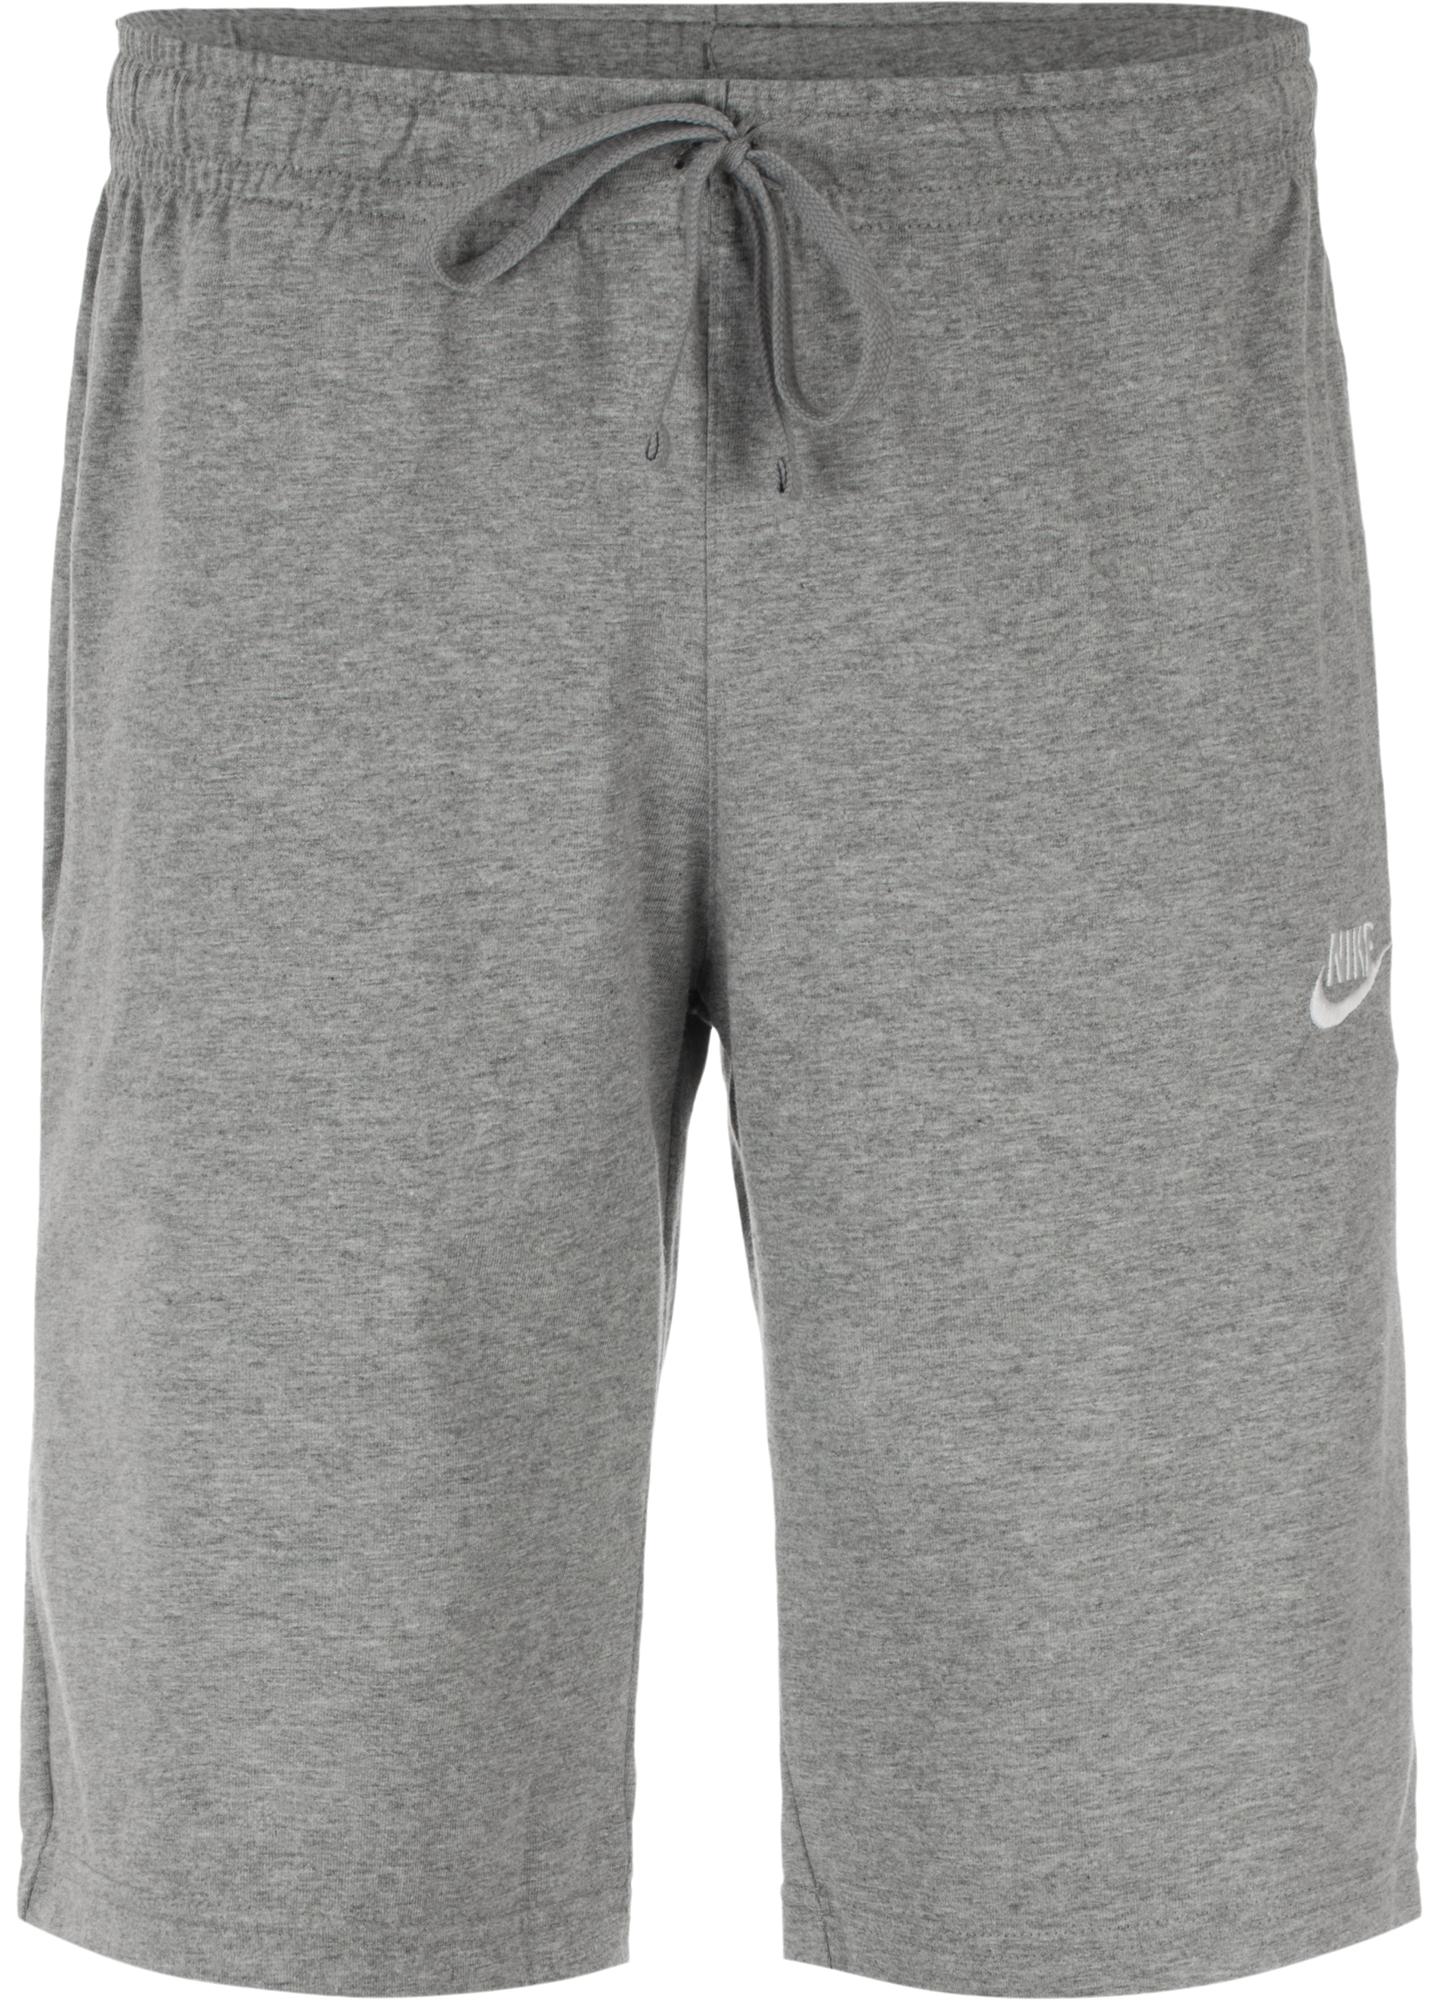 Nike Шорты мужские Nike Sportswear блузон стеганый в байкерском стиле guprady